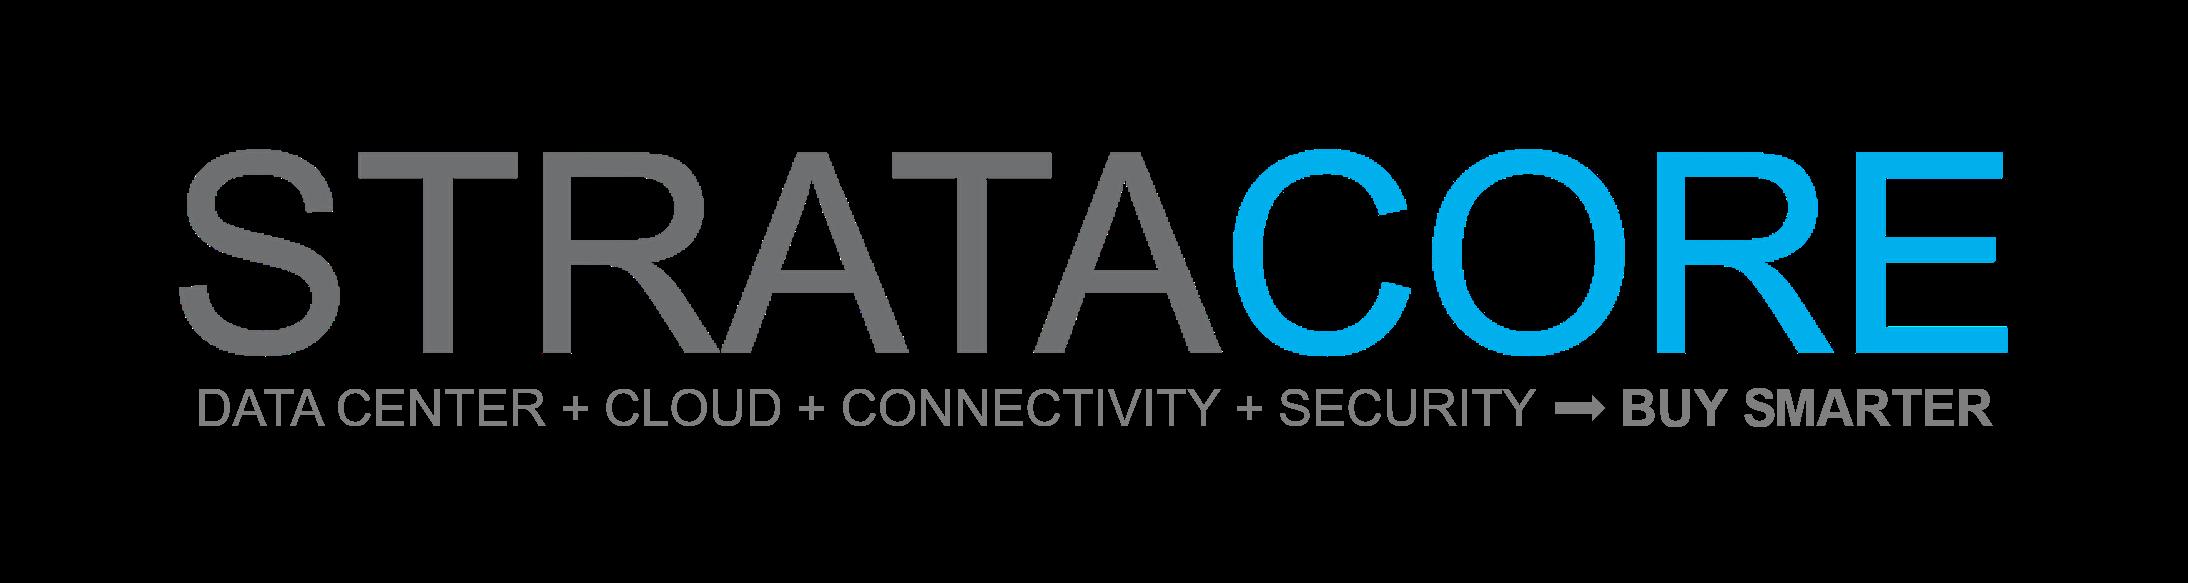 StrataCore Logo - 2020 New Tagline